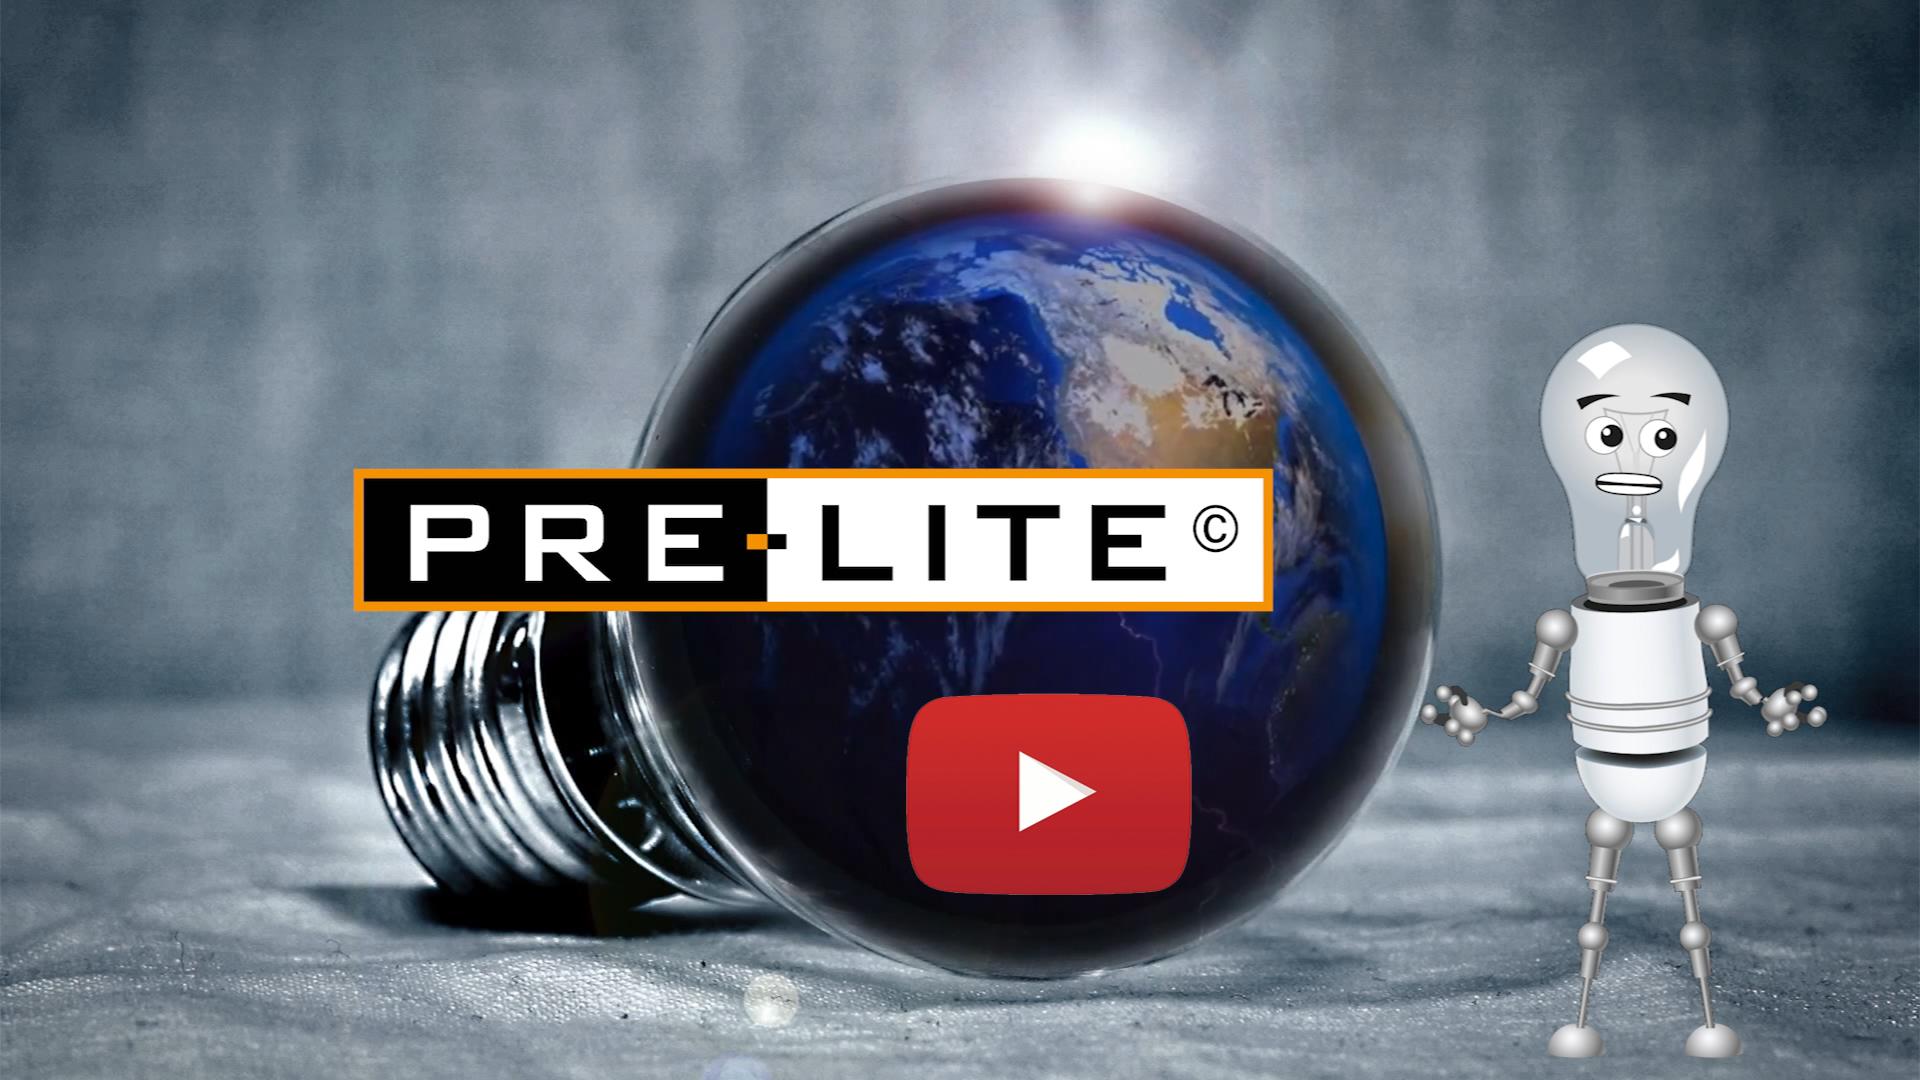 Kijk de Pre-Lite Video